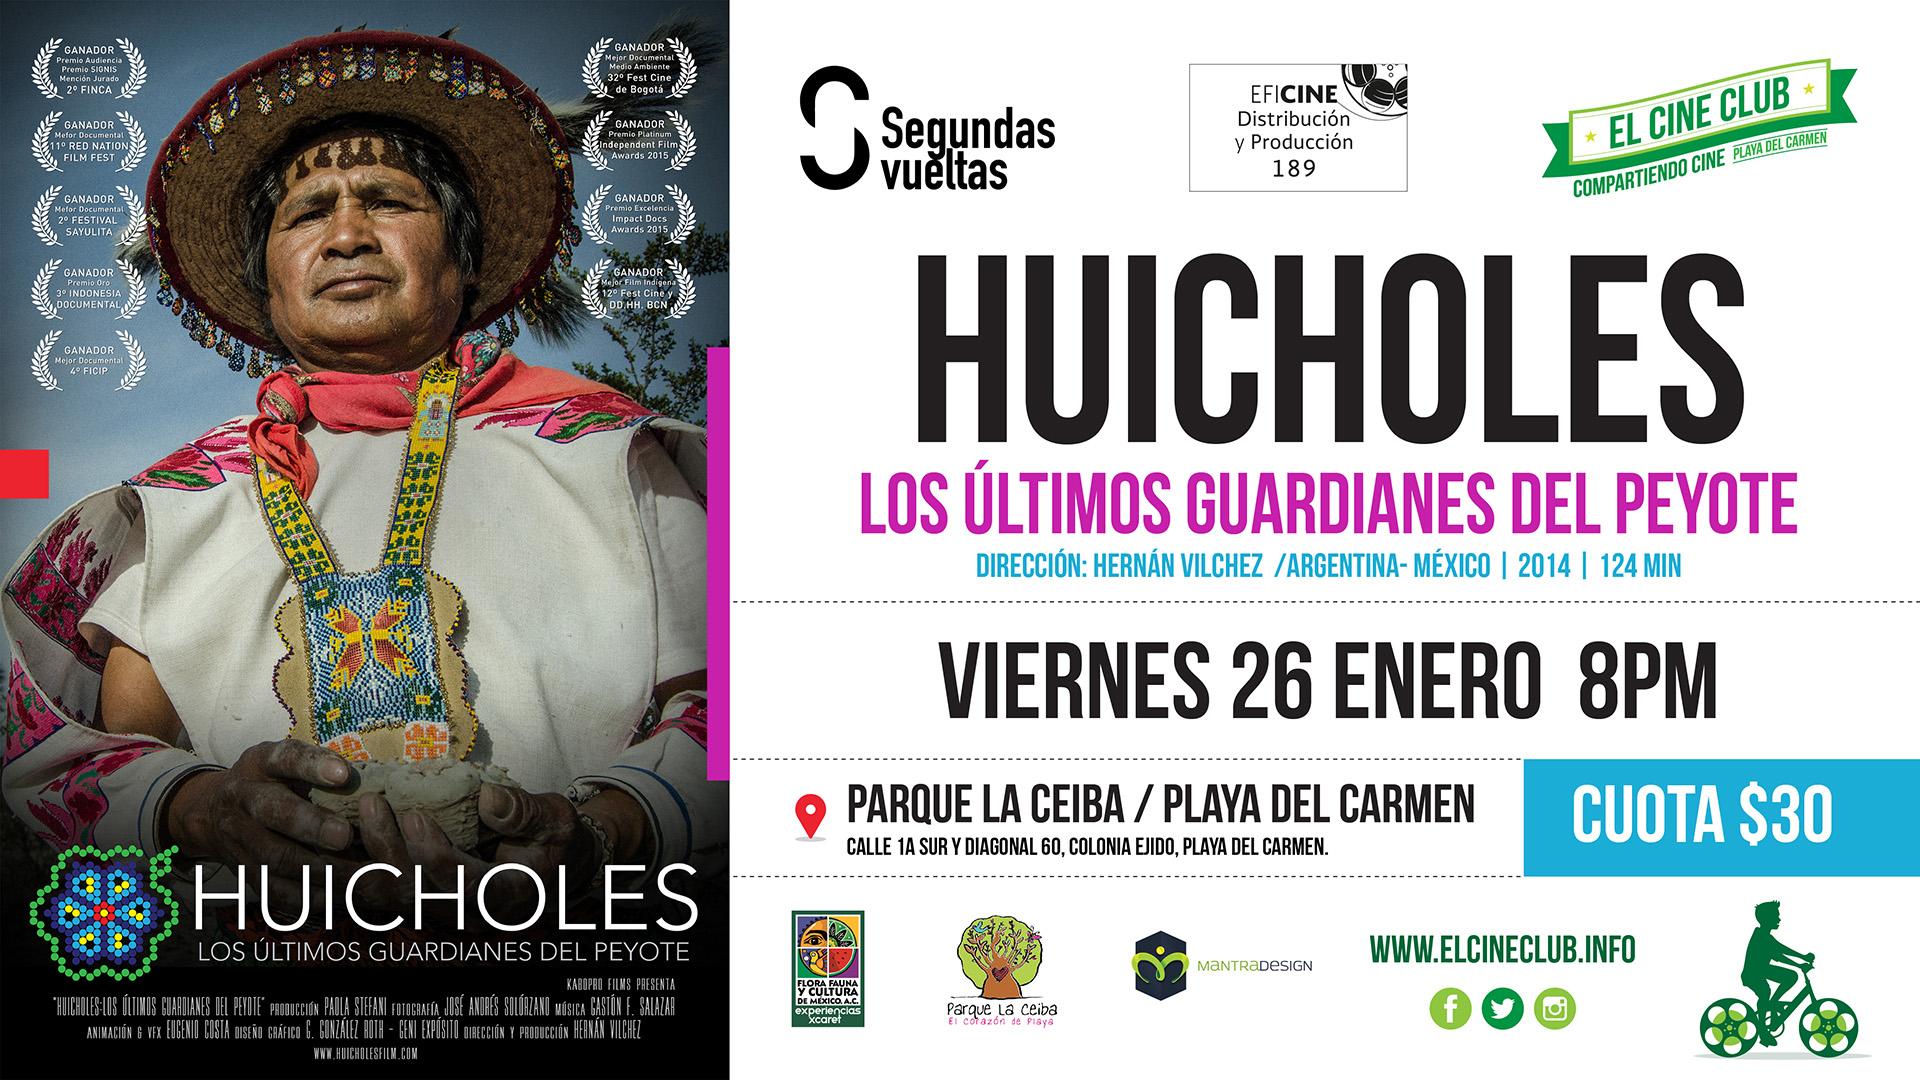 Huicholes_Segundas_Vueltas-09.jpg